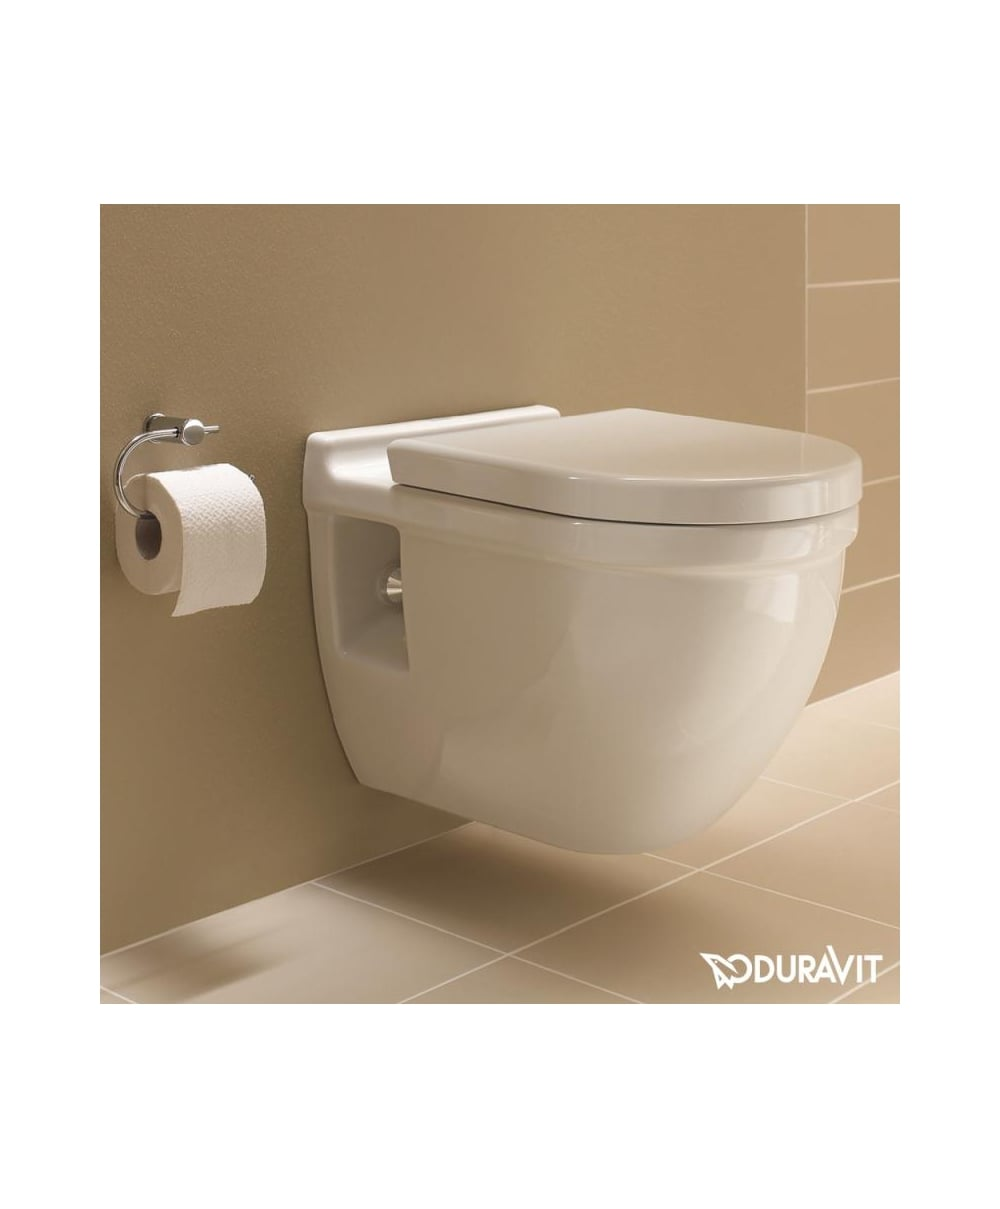 Starck 3 Toilet Seat